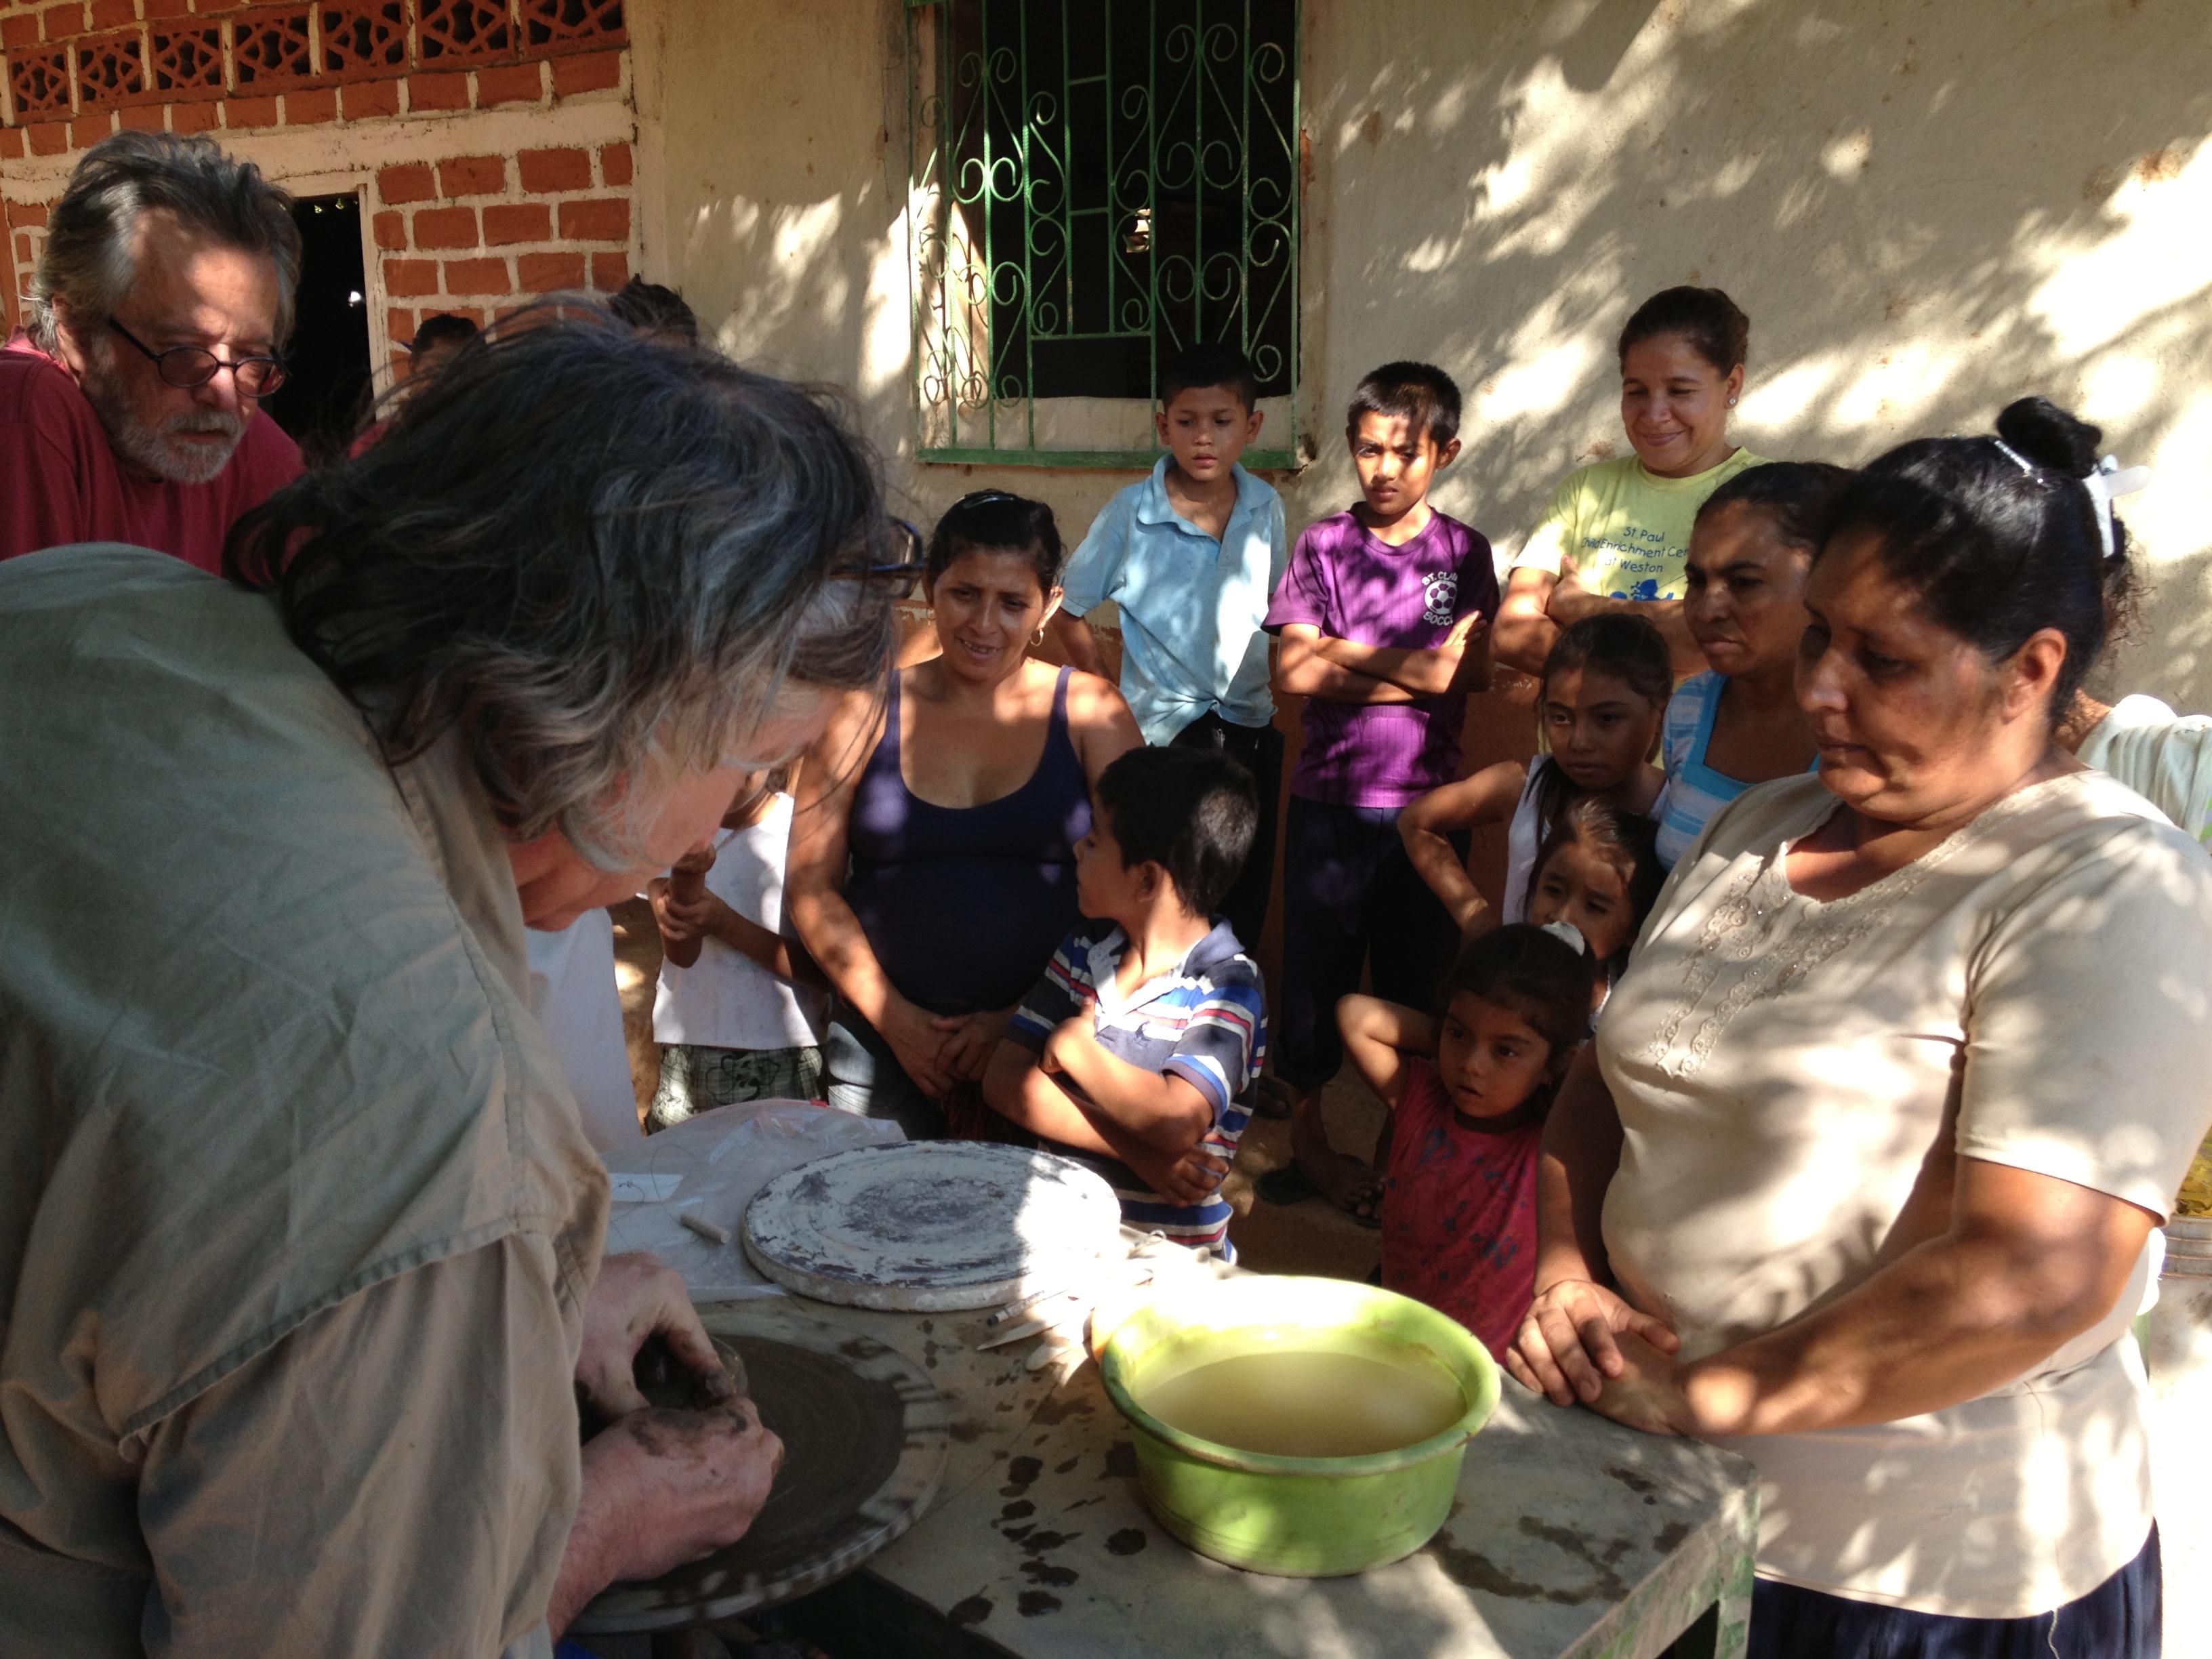 Steve demonstrating technique in El Ojoche, Nicaragua.